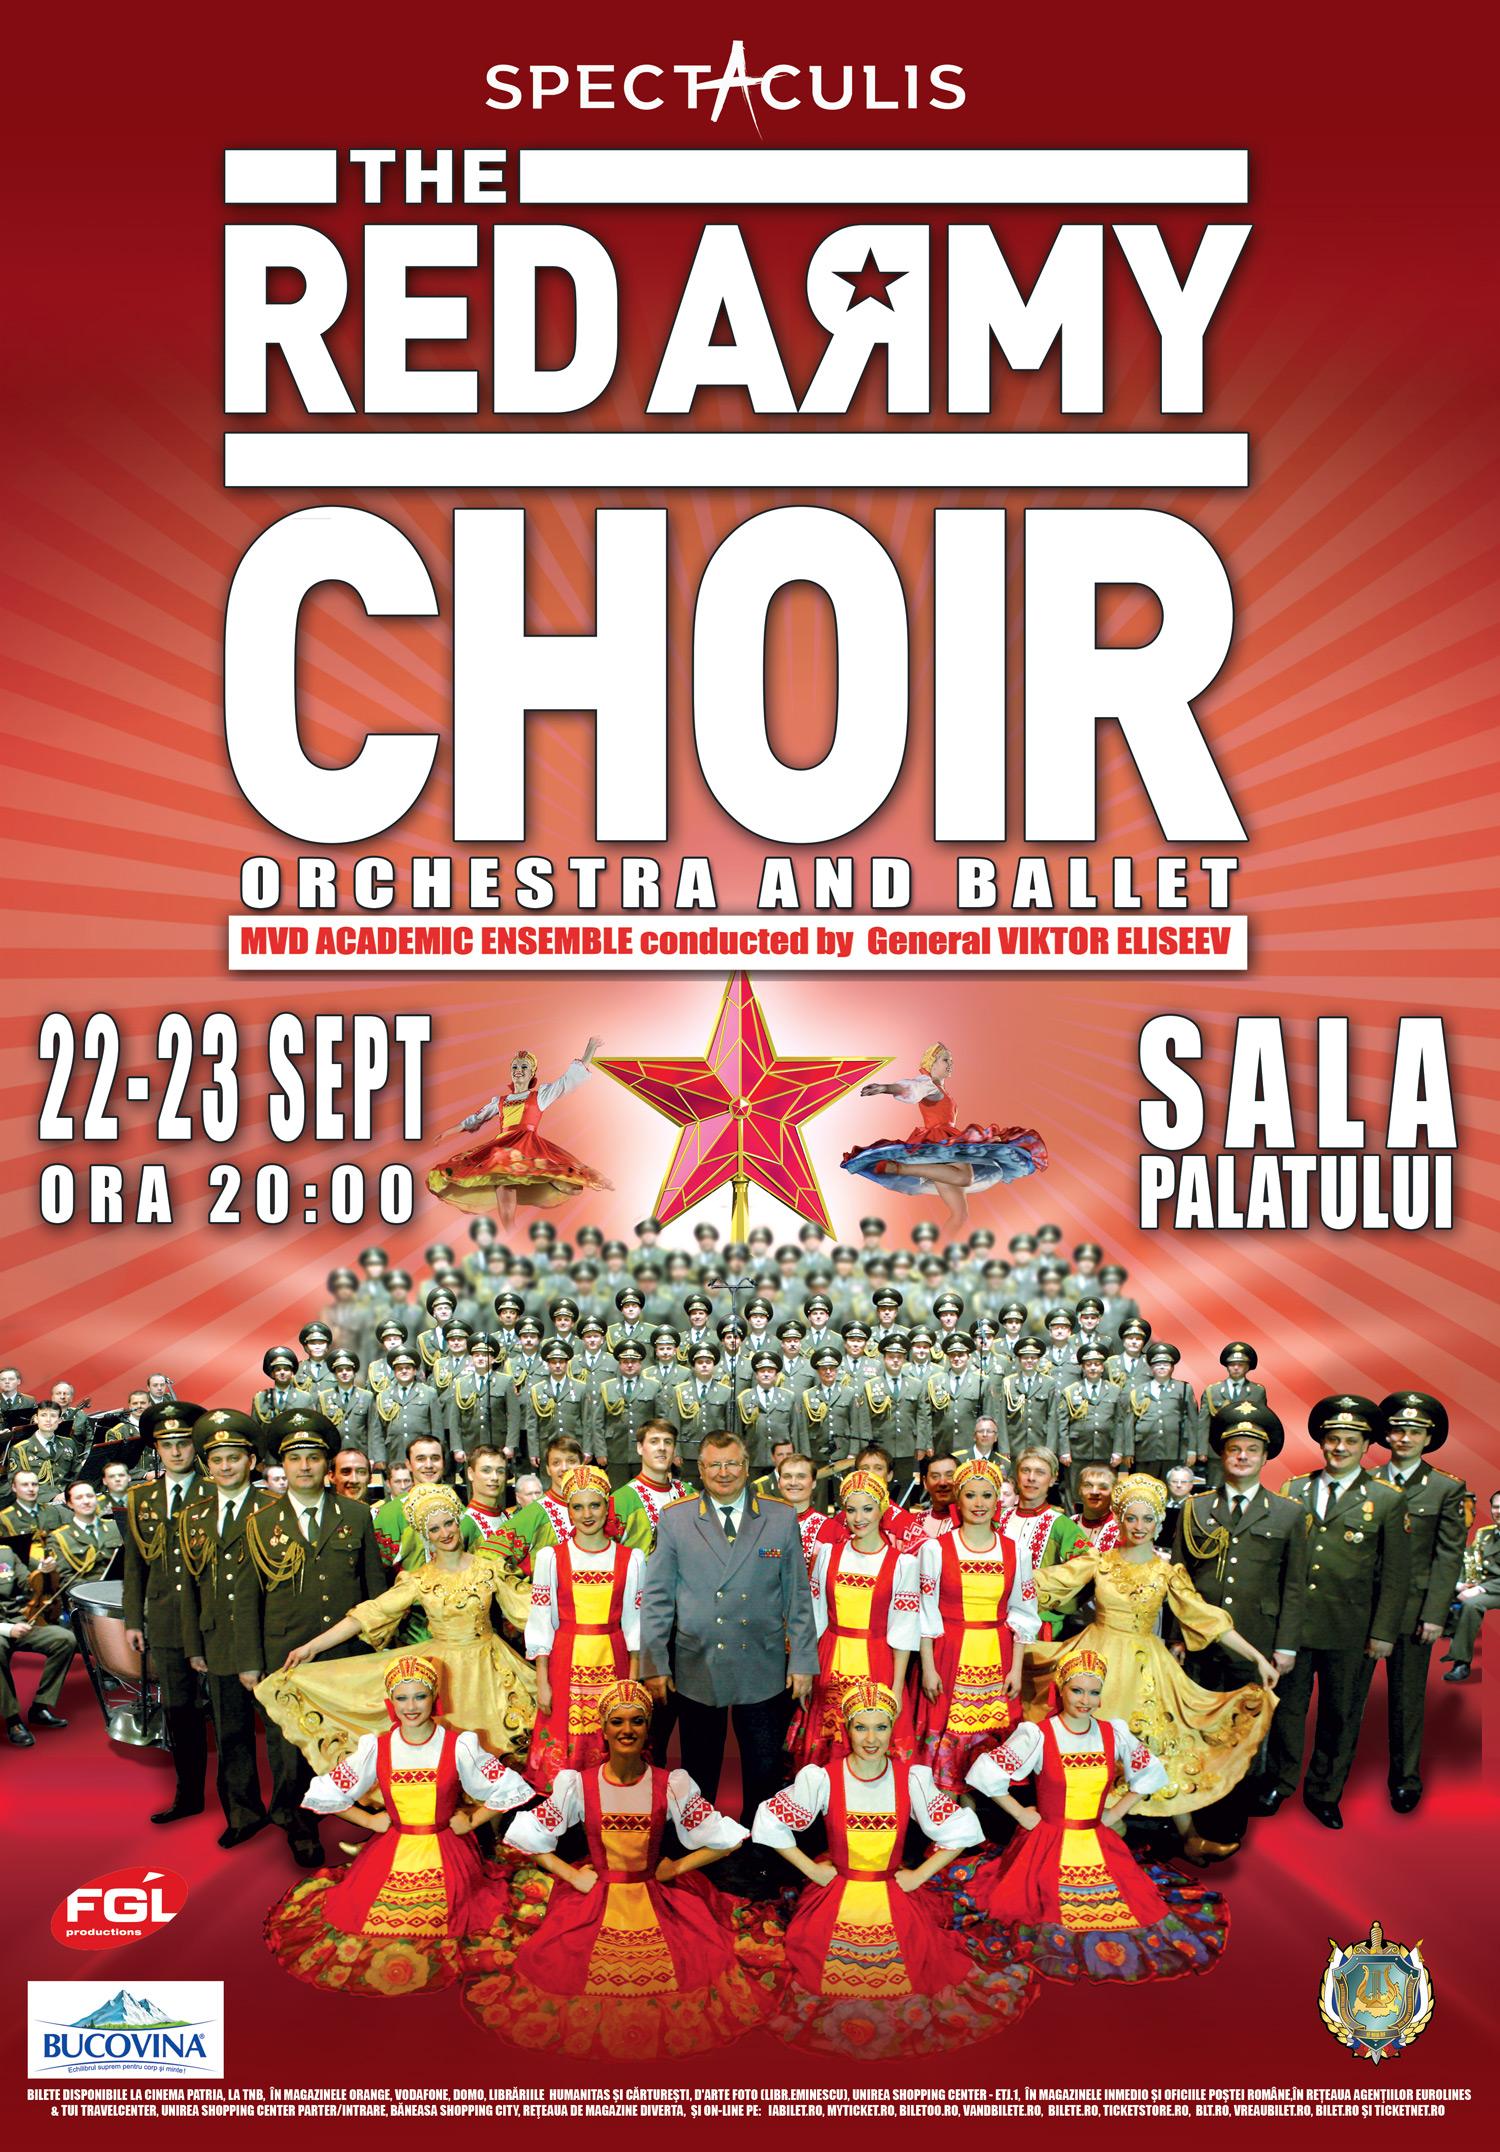 The Red Army Choir